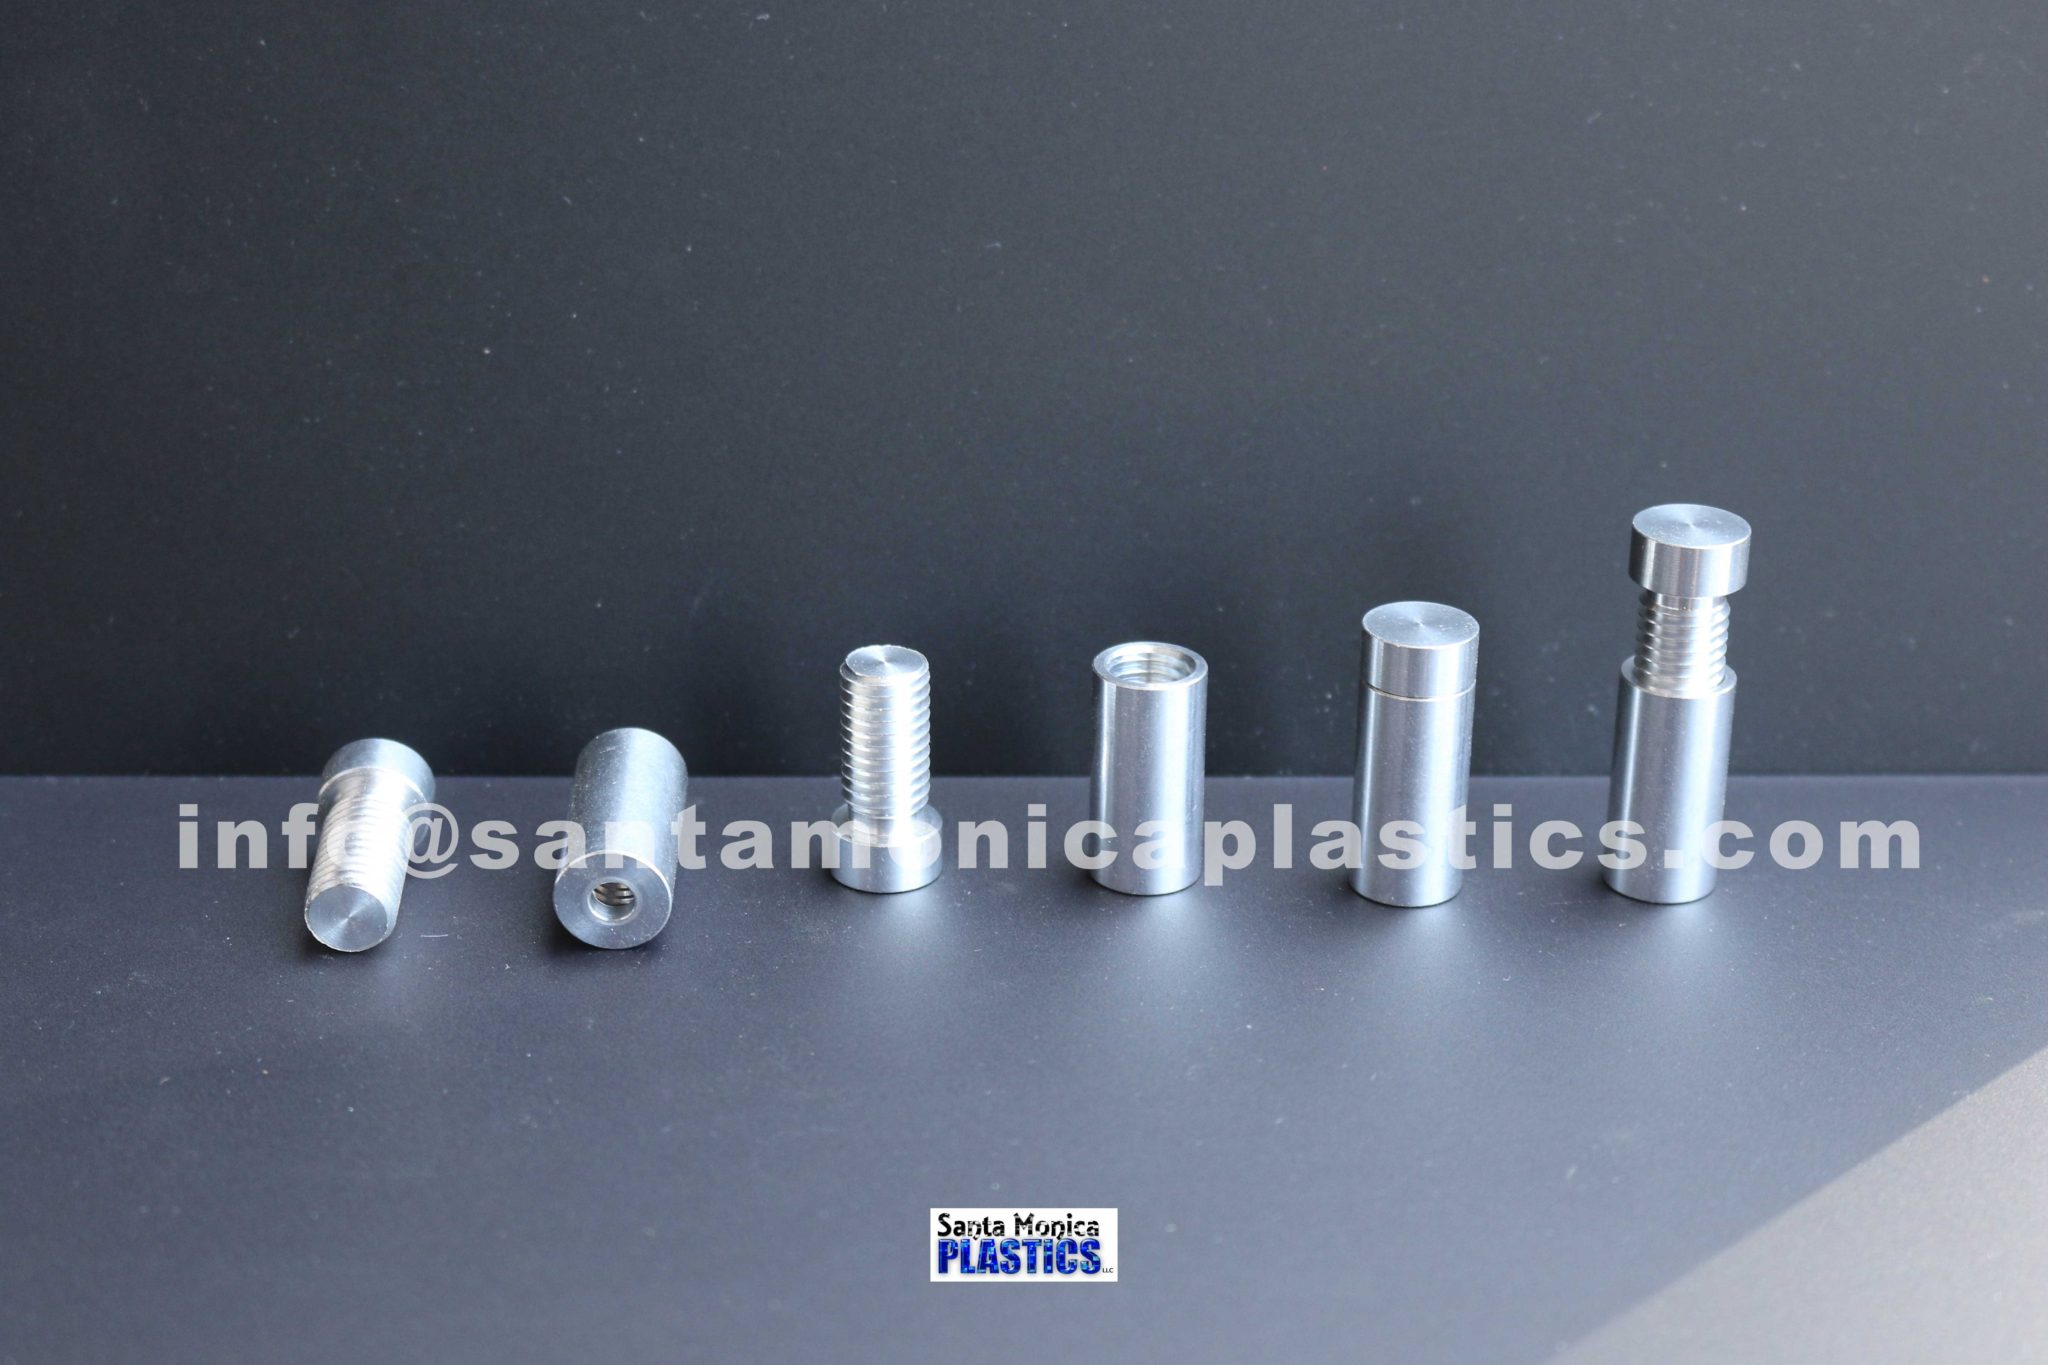 "Aluminum Standoffs #2 Size 0.5"" X 1.25"" (4 Pieces)"